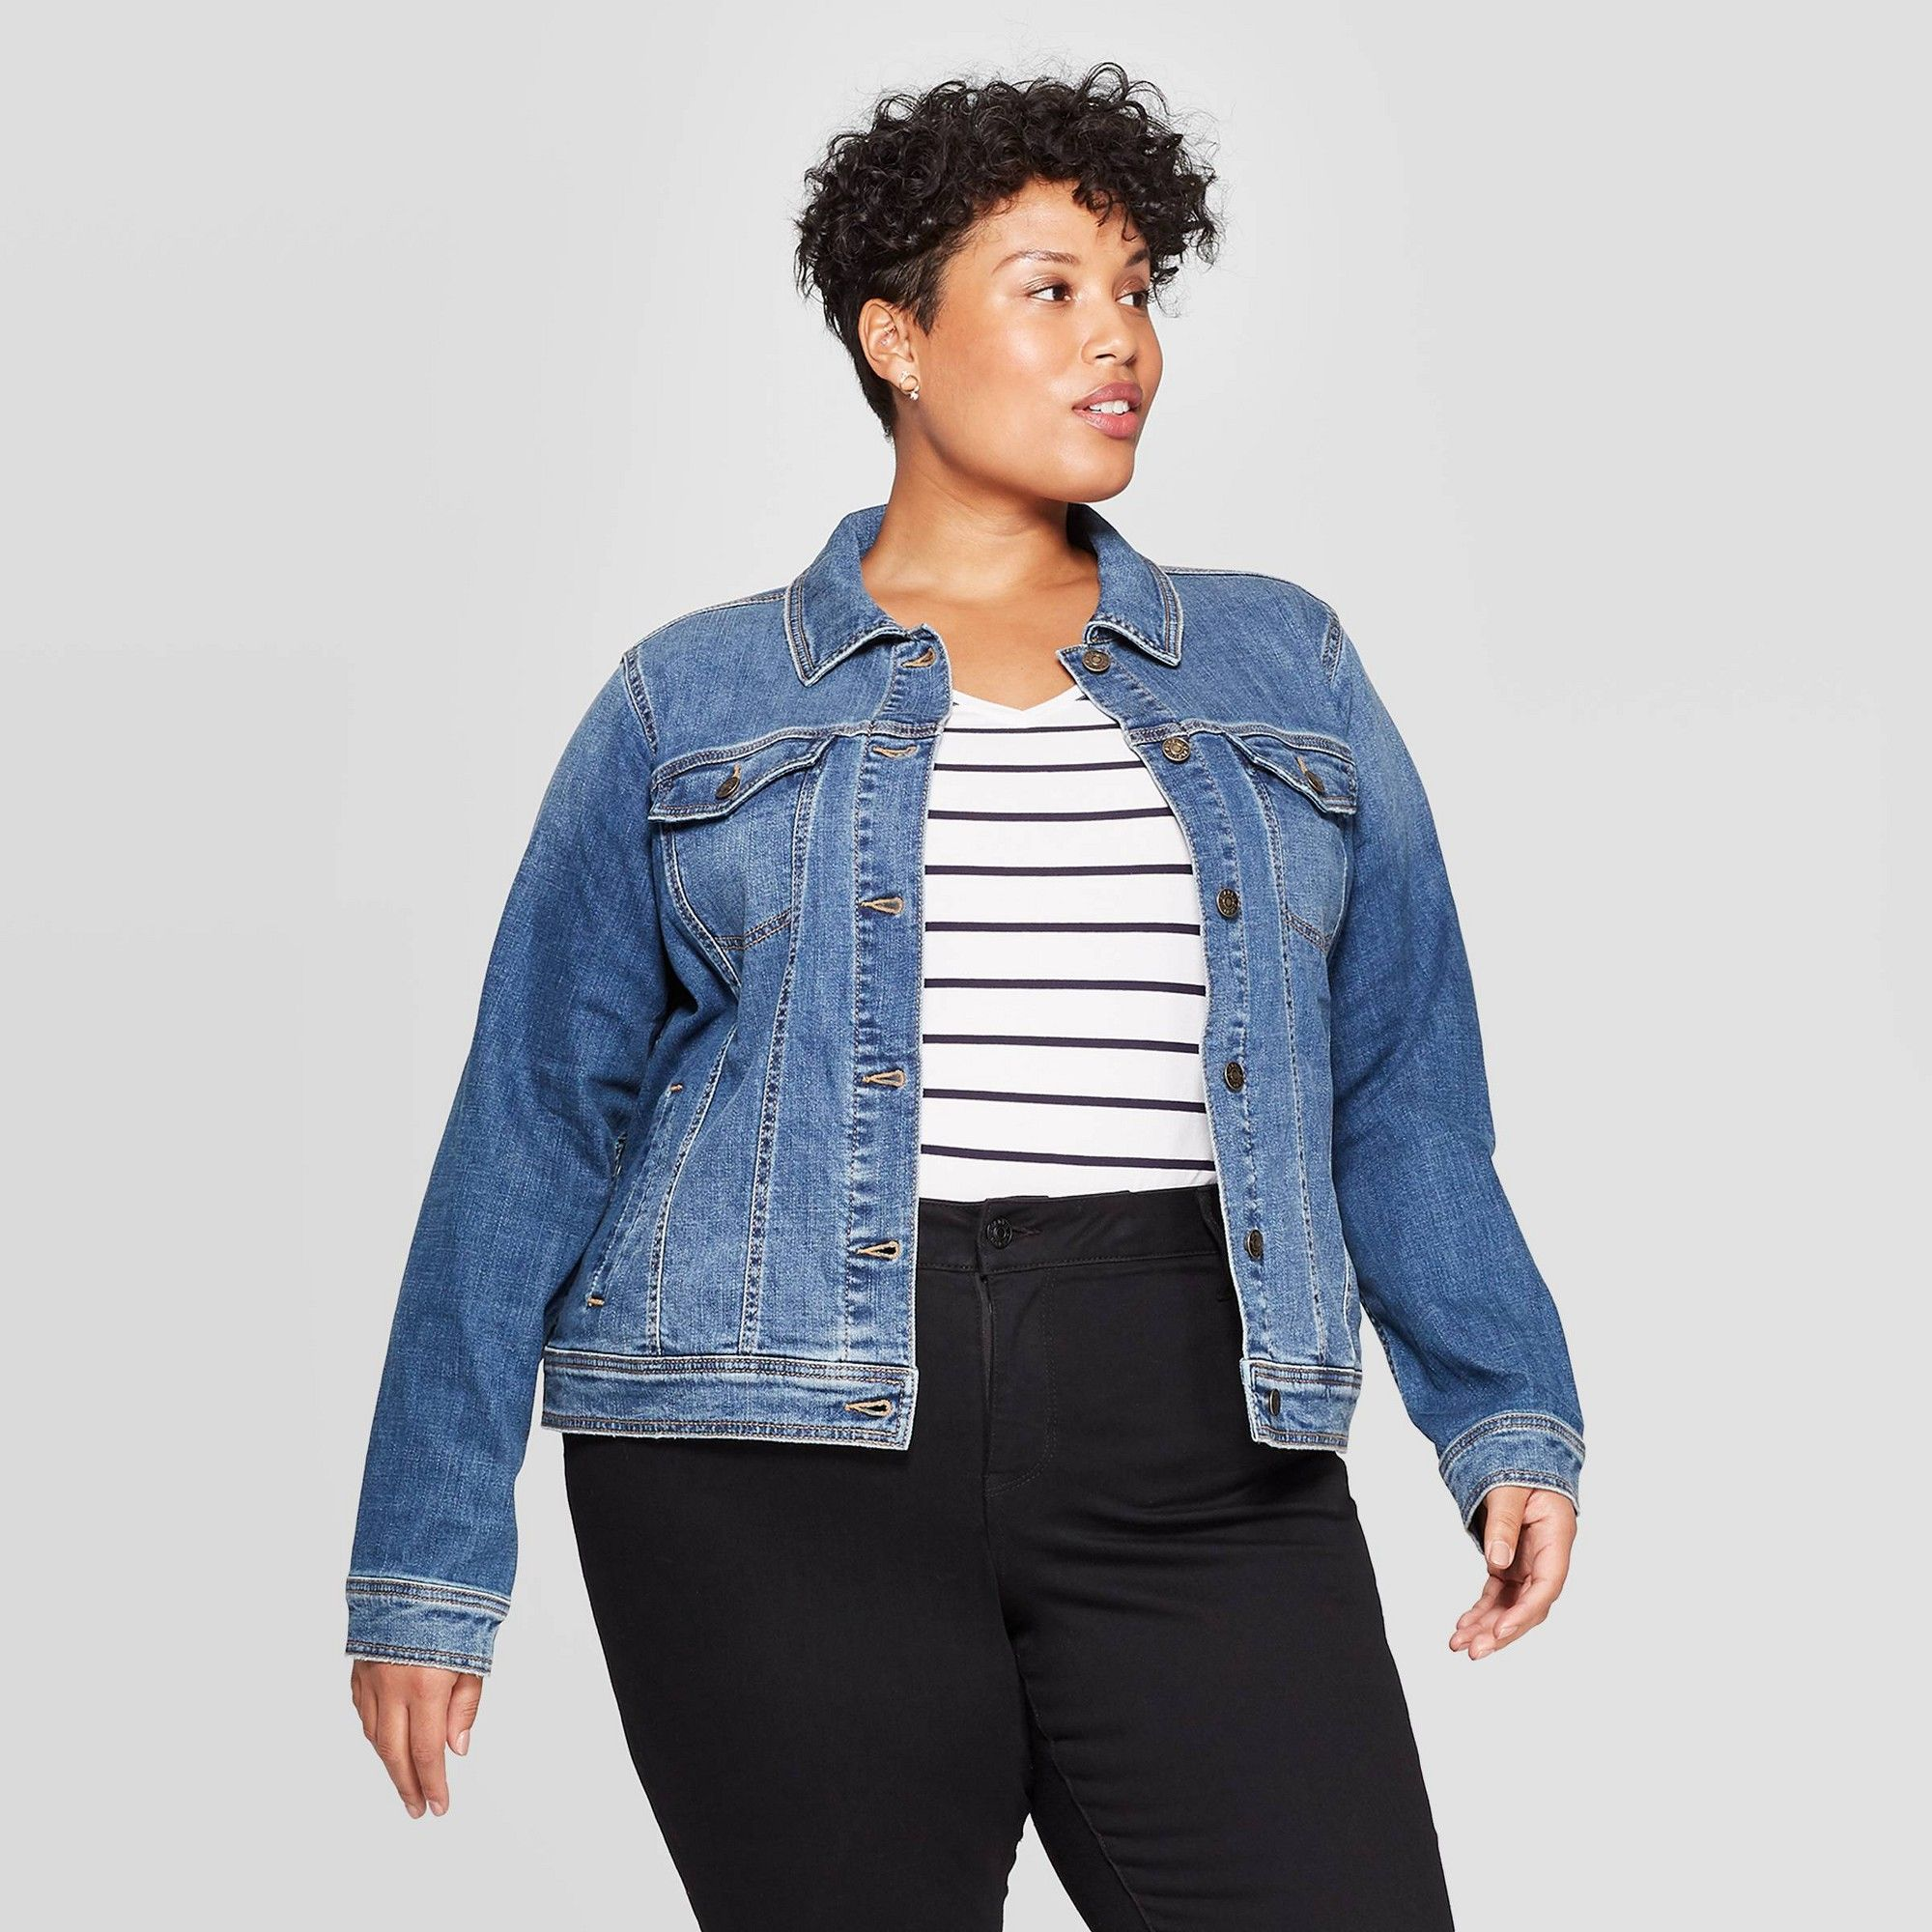 Women S Plus Size Jean Jacket Ava Viv Medium Wash 3x Size 3xl Blue Women S Plus Size Jeans Plus Size Jeans Striped T Shirt Dress [ 2000 x 2000 Pixel ]